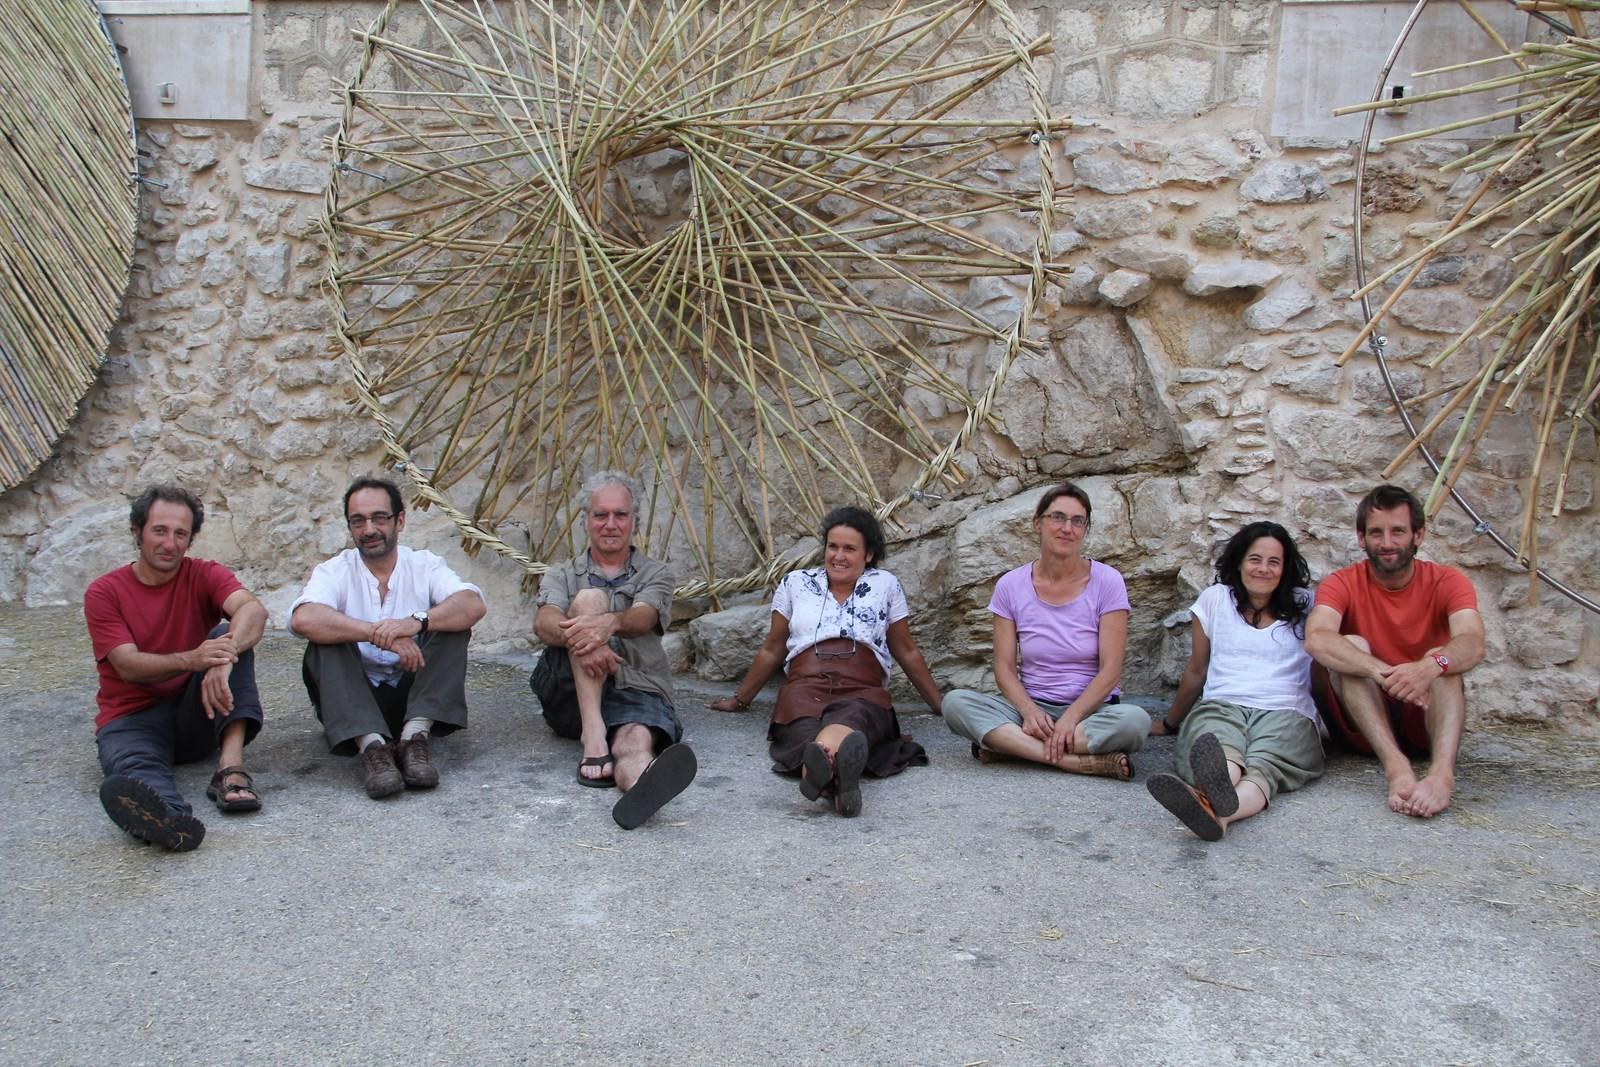 Bravo à Josep, Carles, Joan, Alexandra, Lore, Monica et Tim